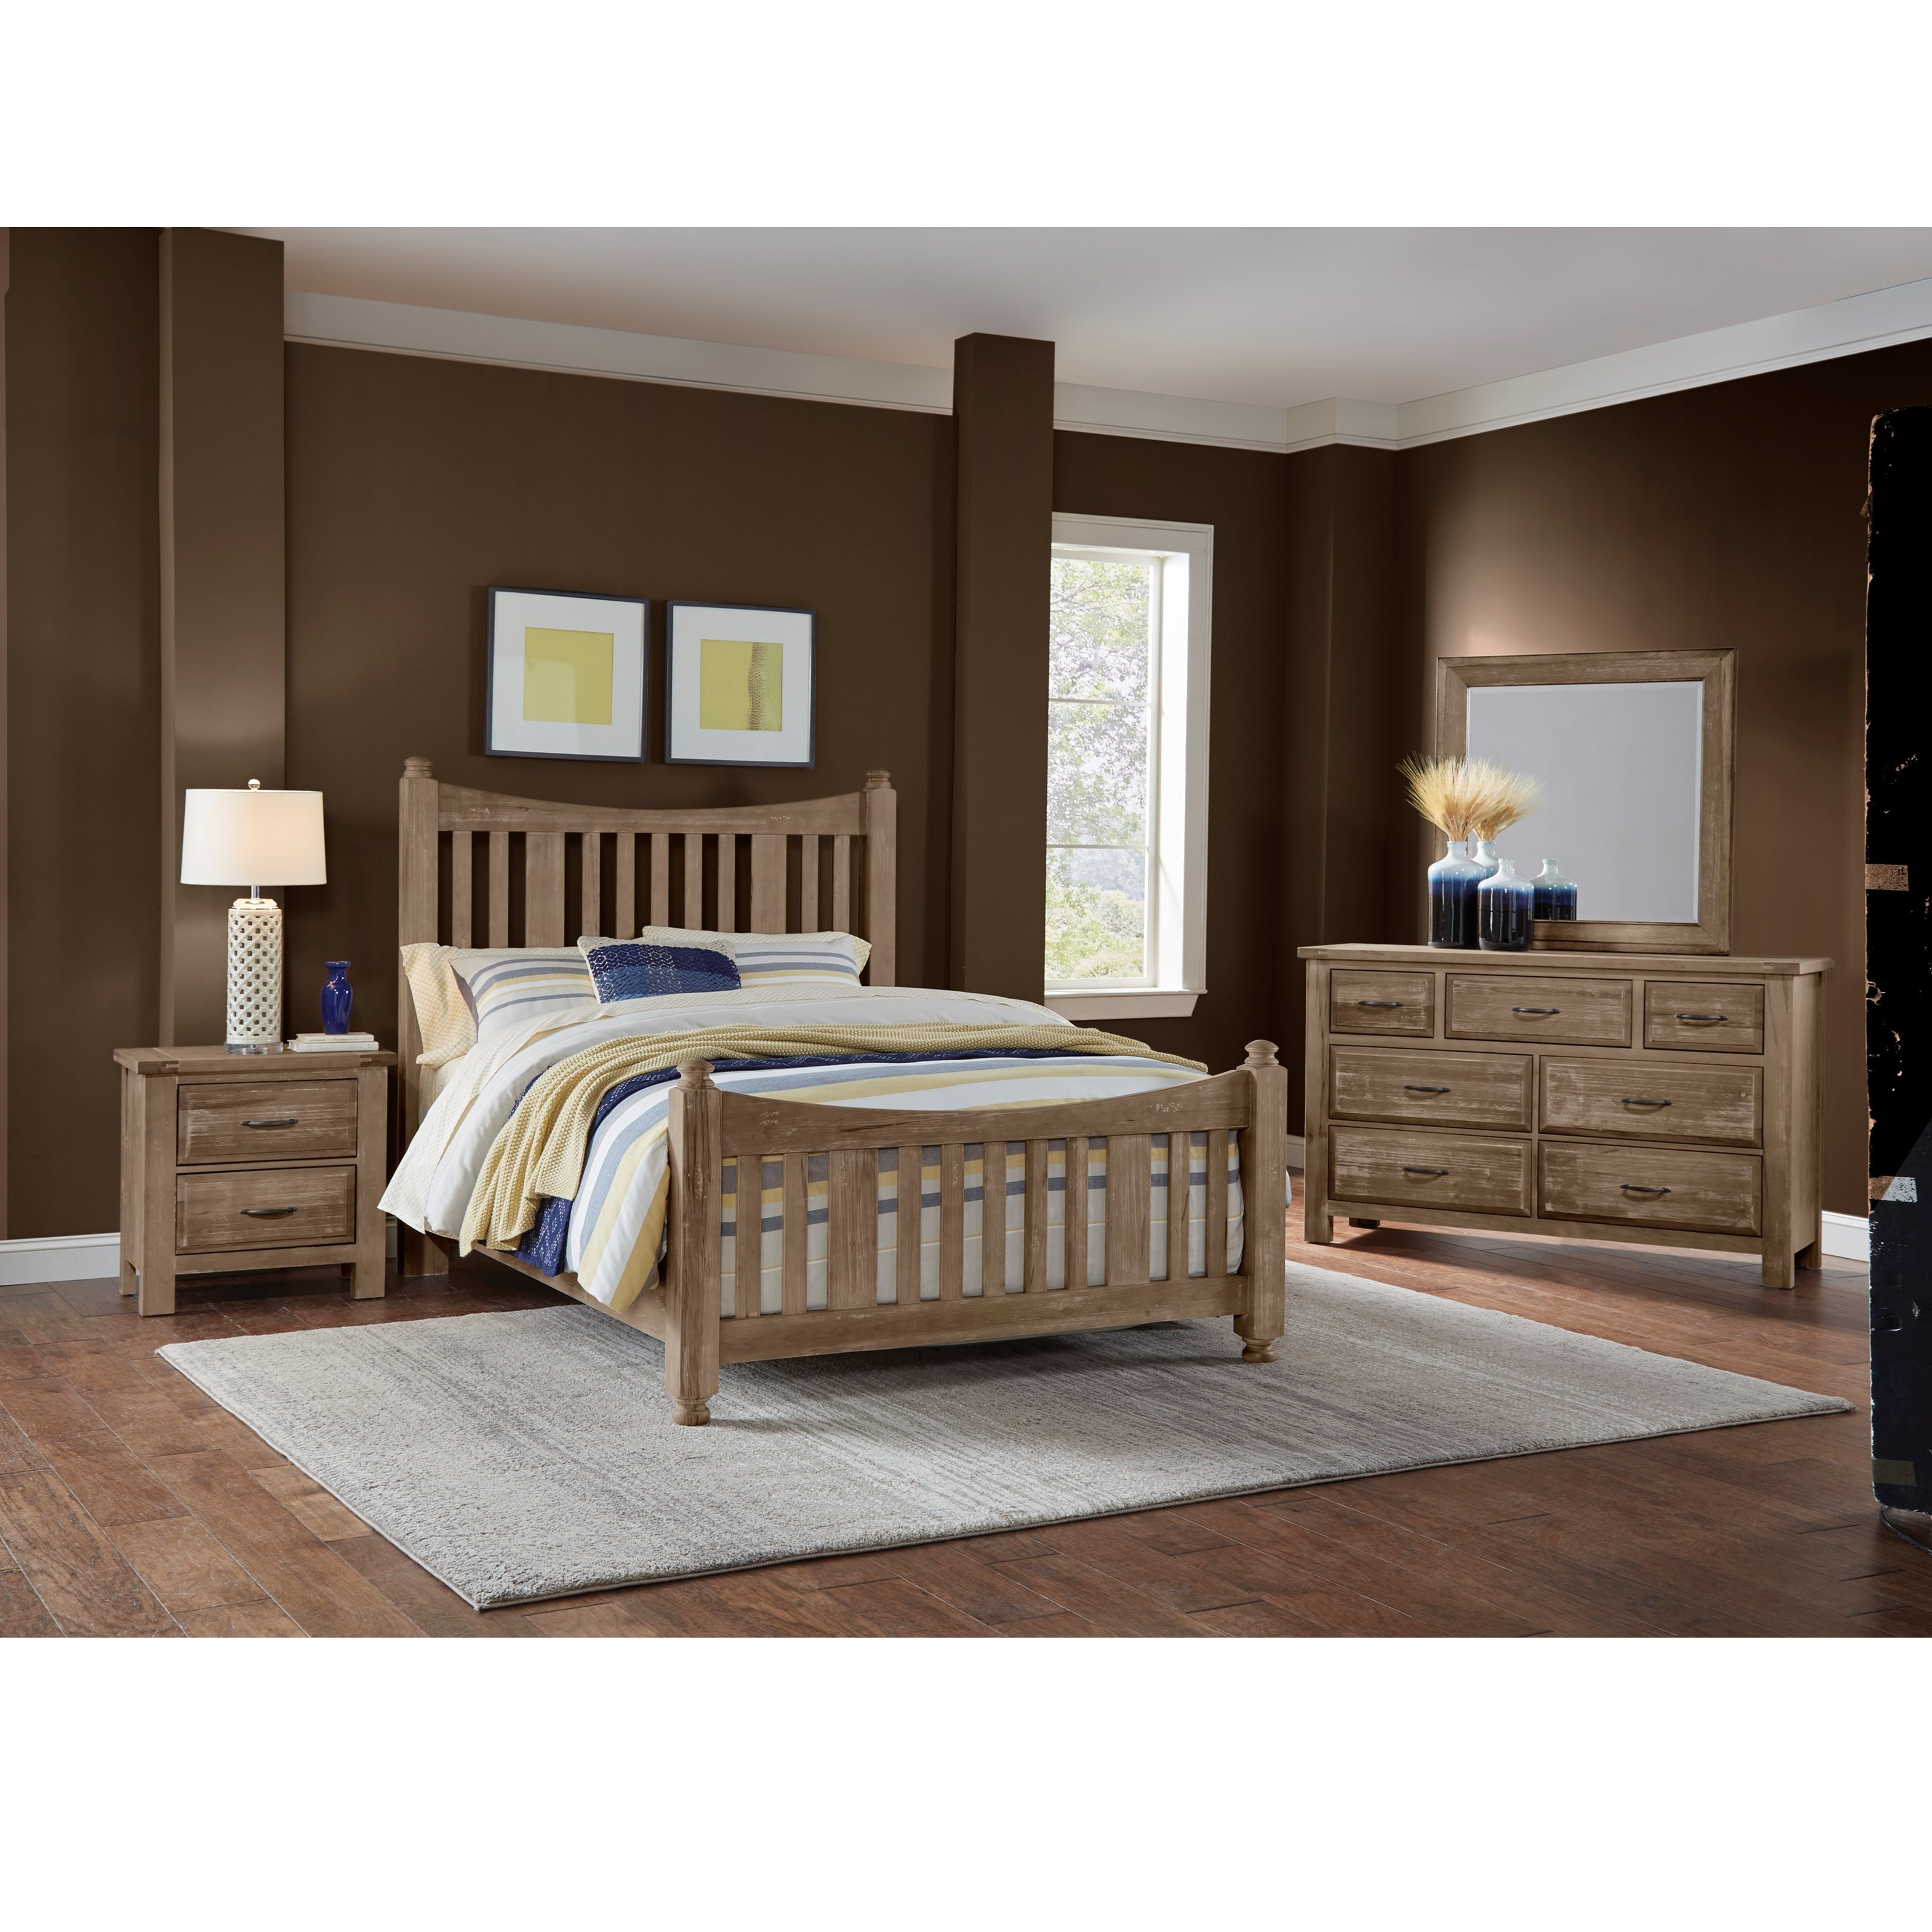 Artisan Post By Vaughan Bassett Maple Road Solid Wood Queen Slat Poster Bed Becker Furniture